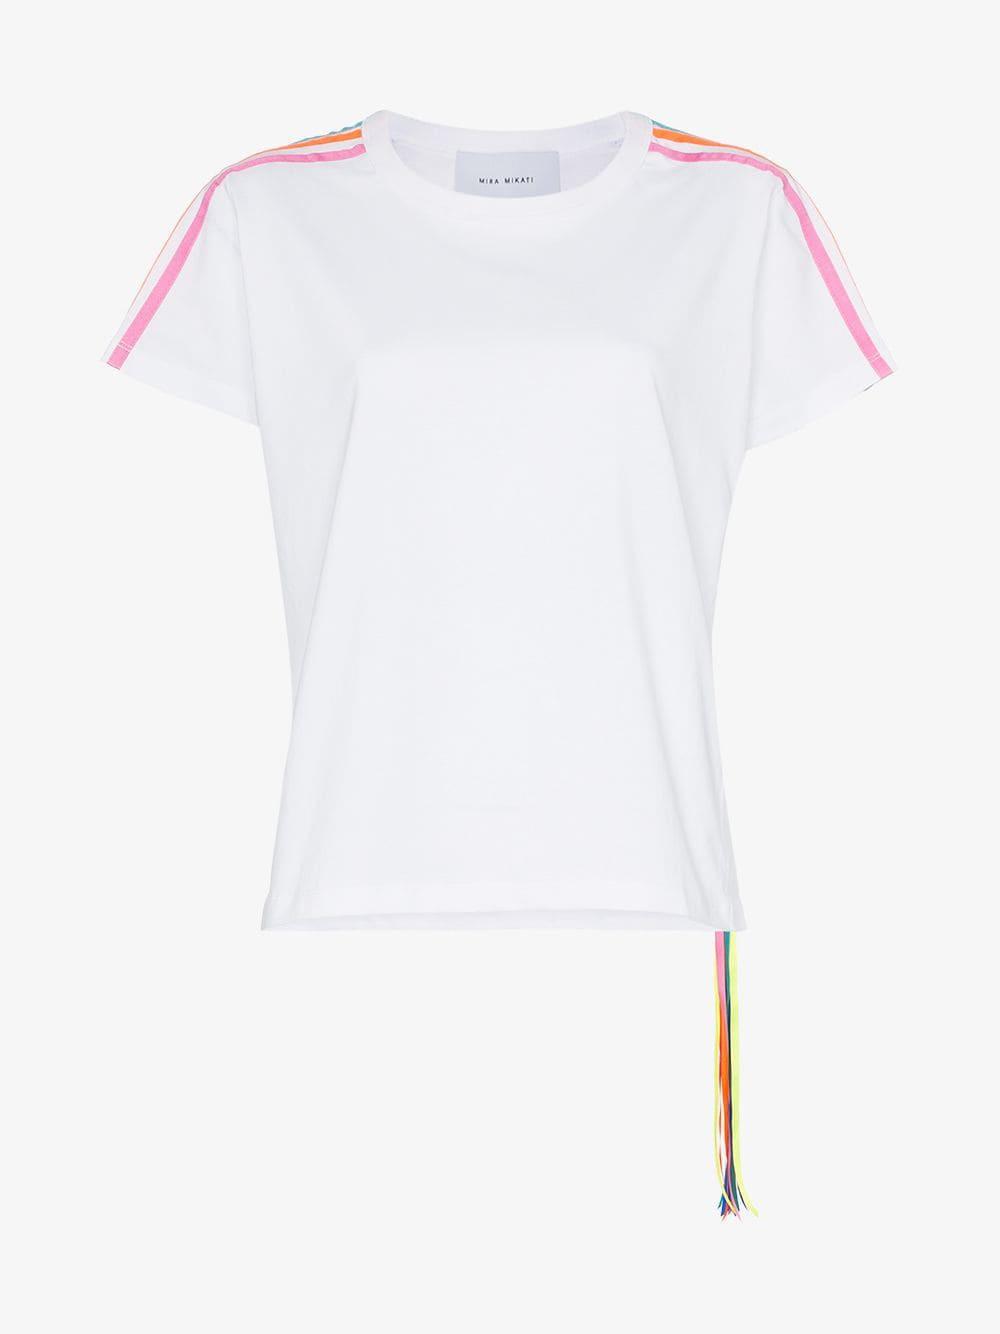 Mira Mikati multicoloured racing stripes T-shirt in white